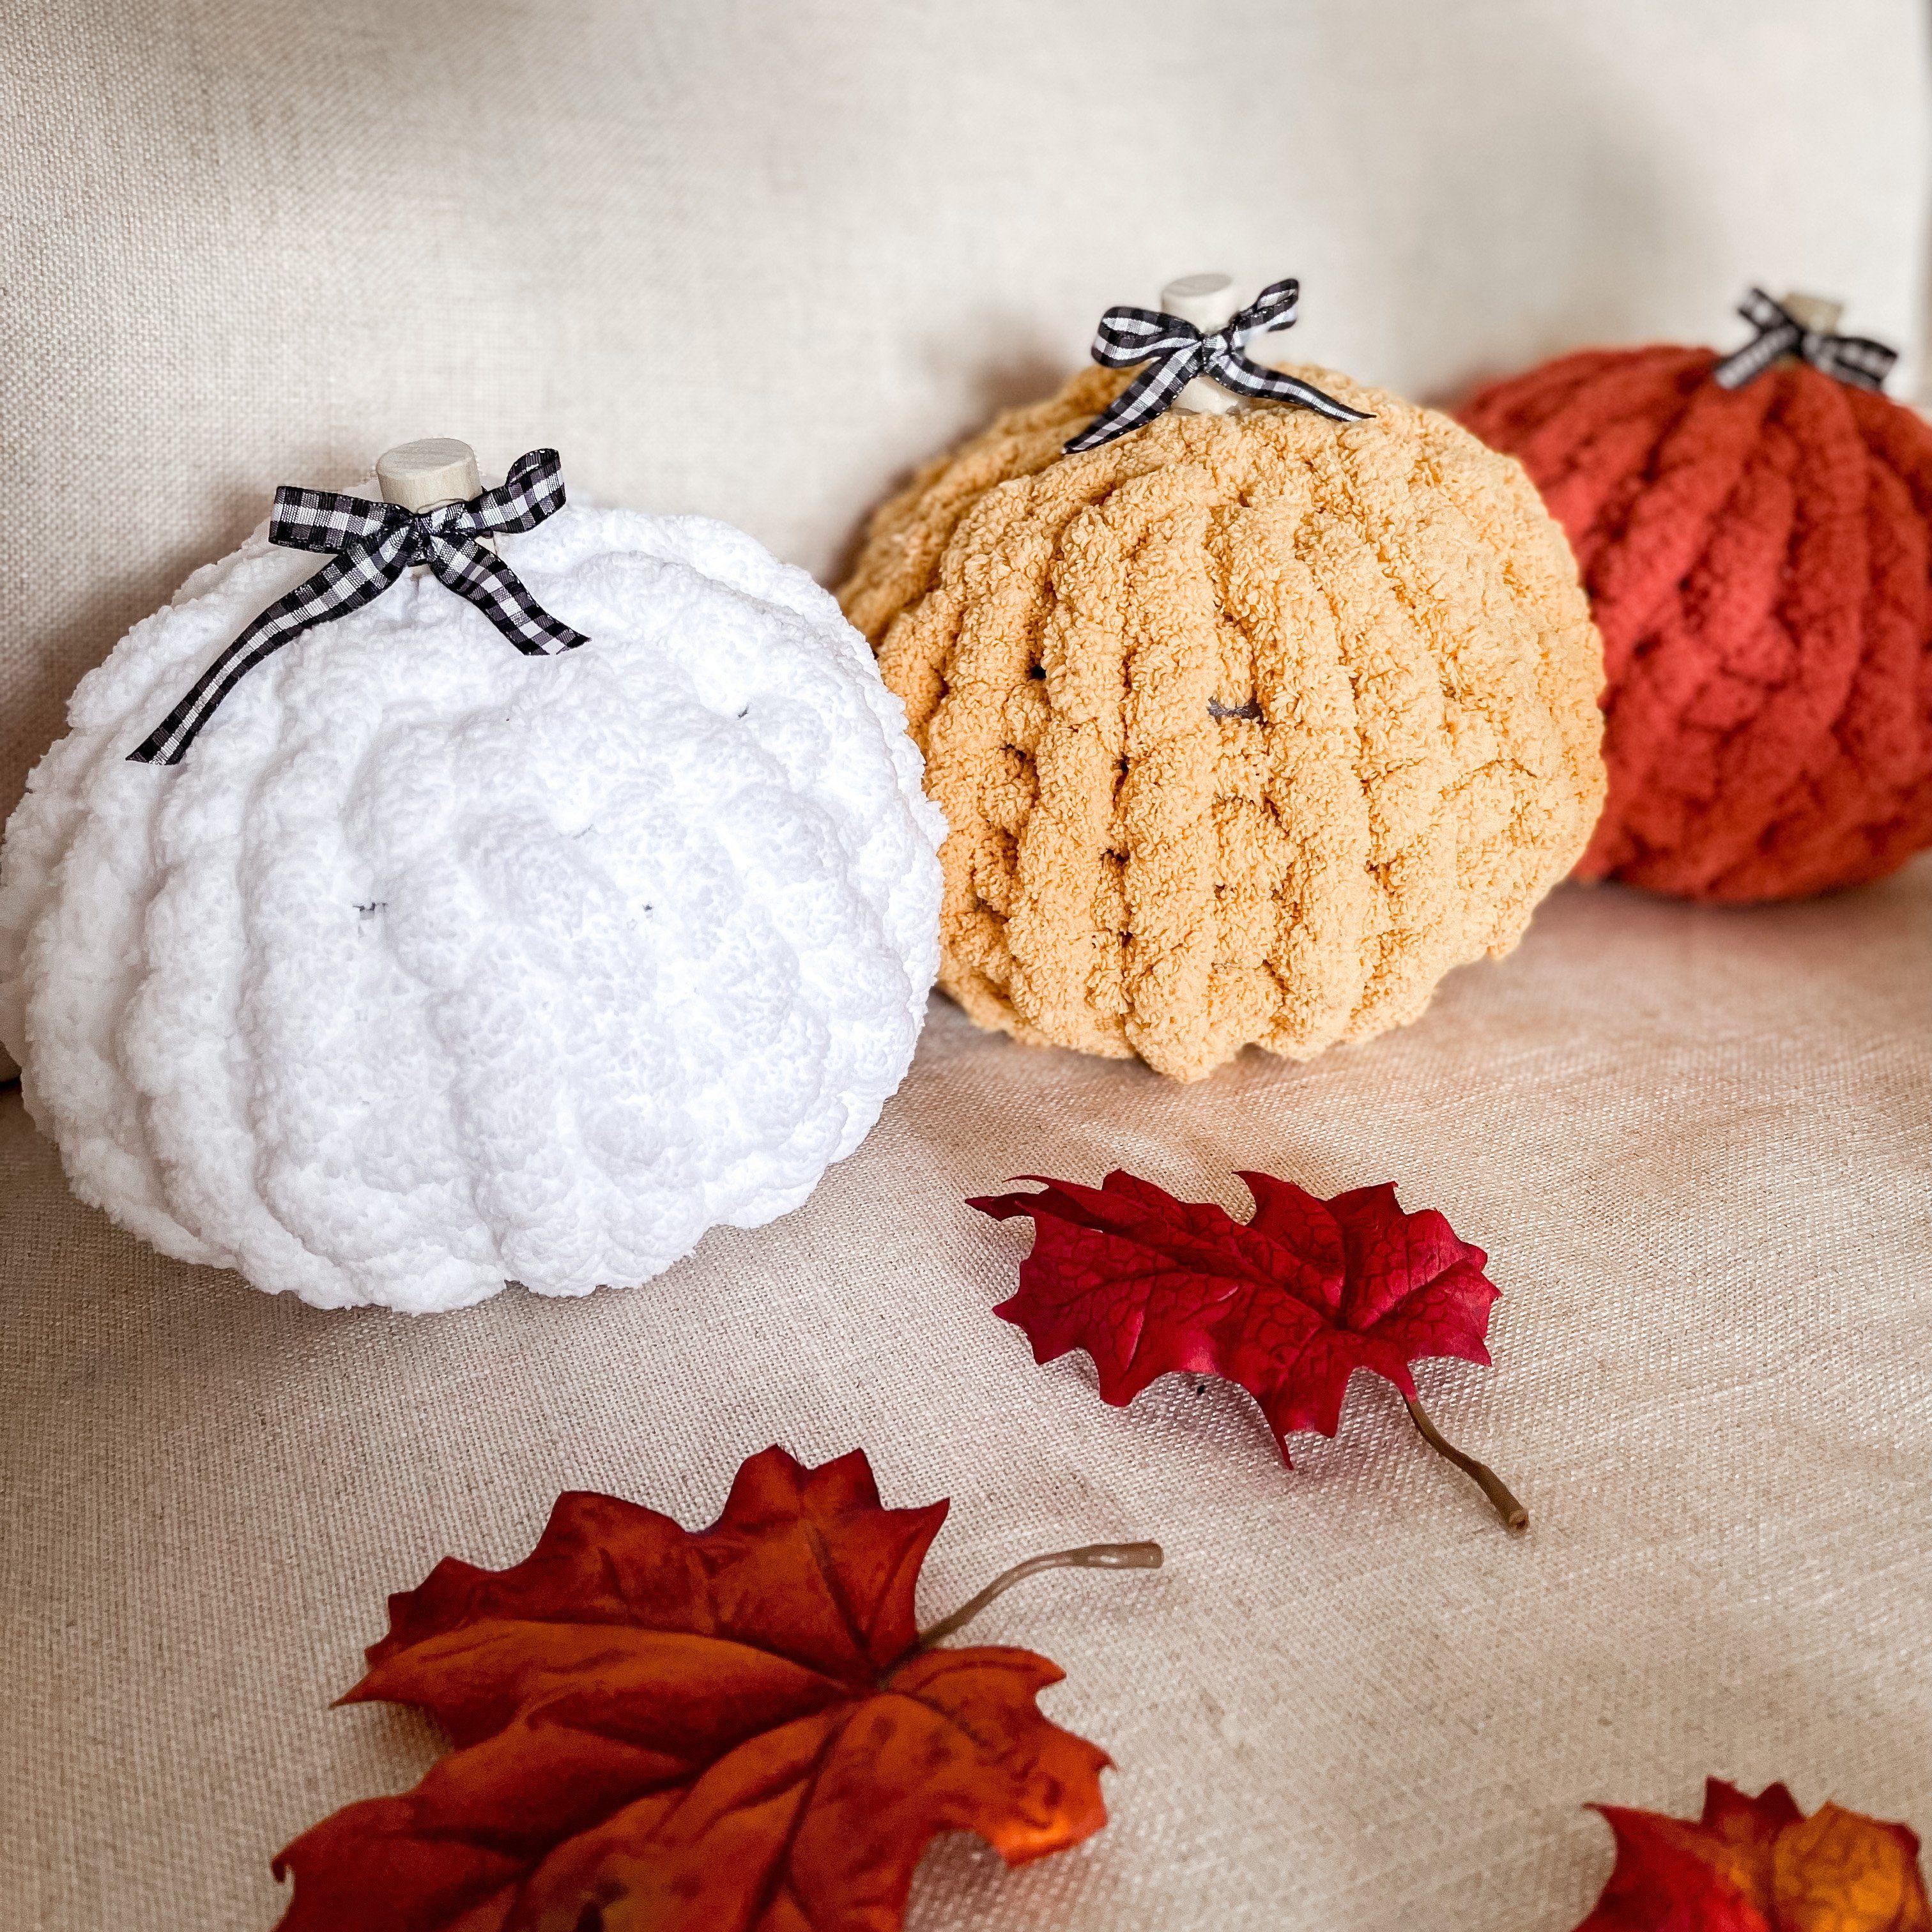 Handmade Vintage/Farmhouse Style Pumpkins - with ribbon - Spa Blue